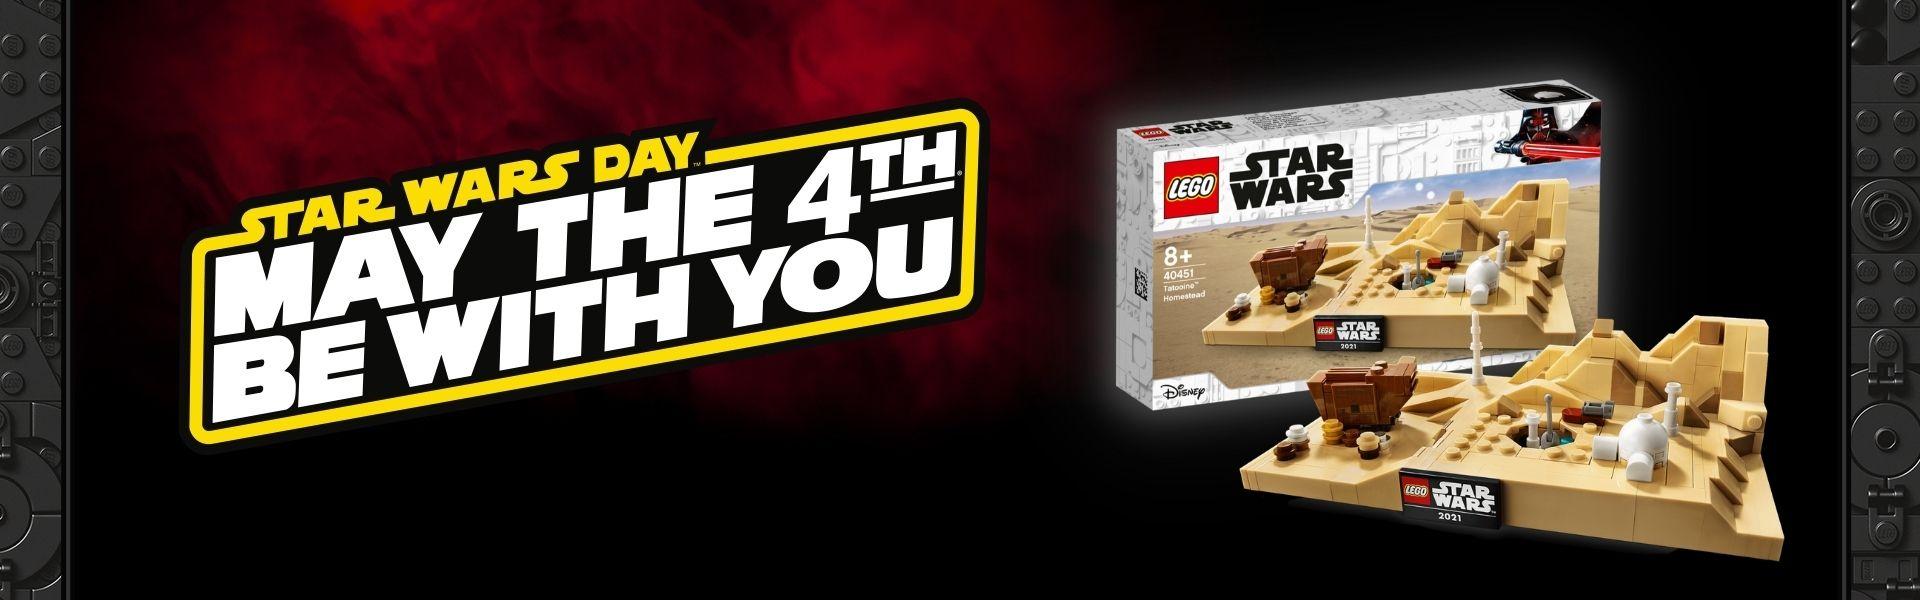 LEGO Star Wars May the 4th Tatooine Homestead